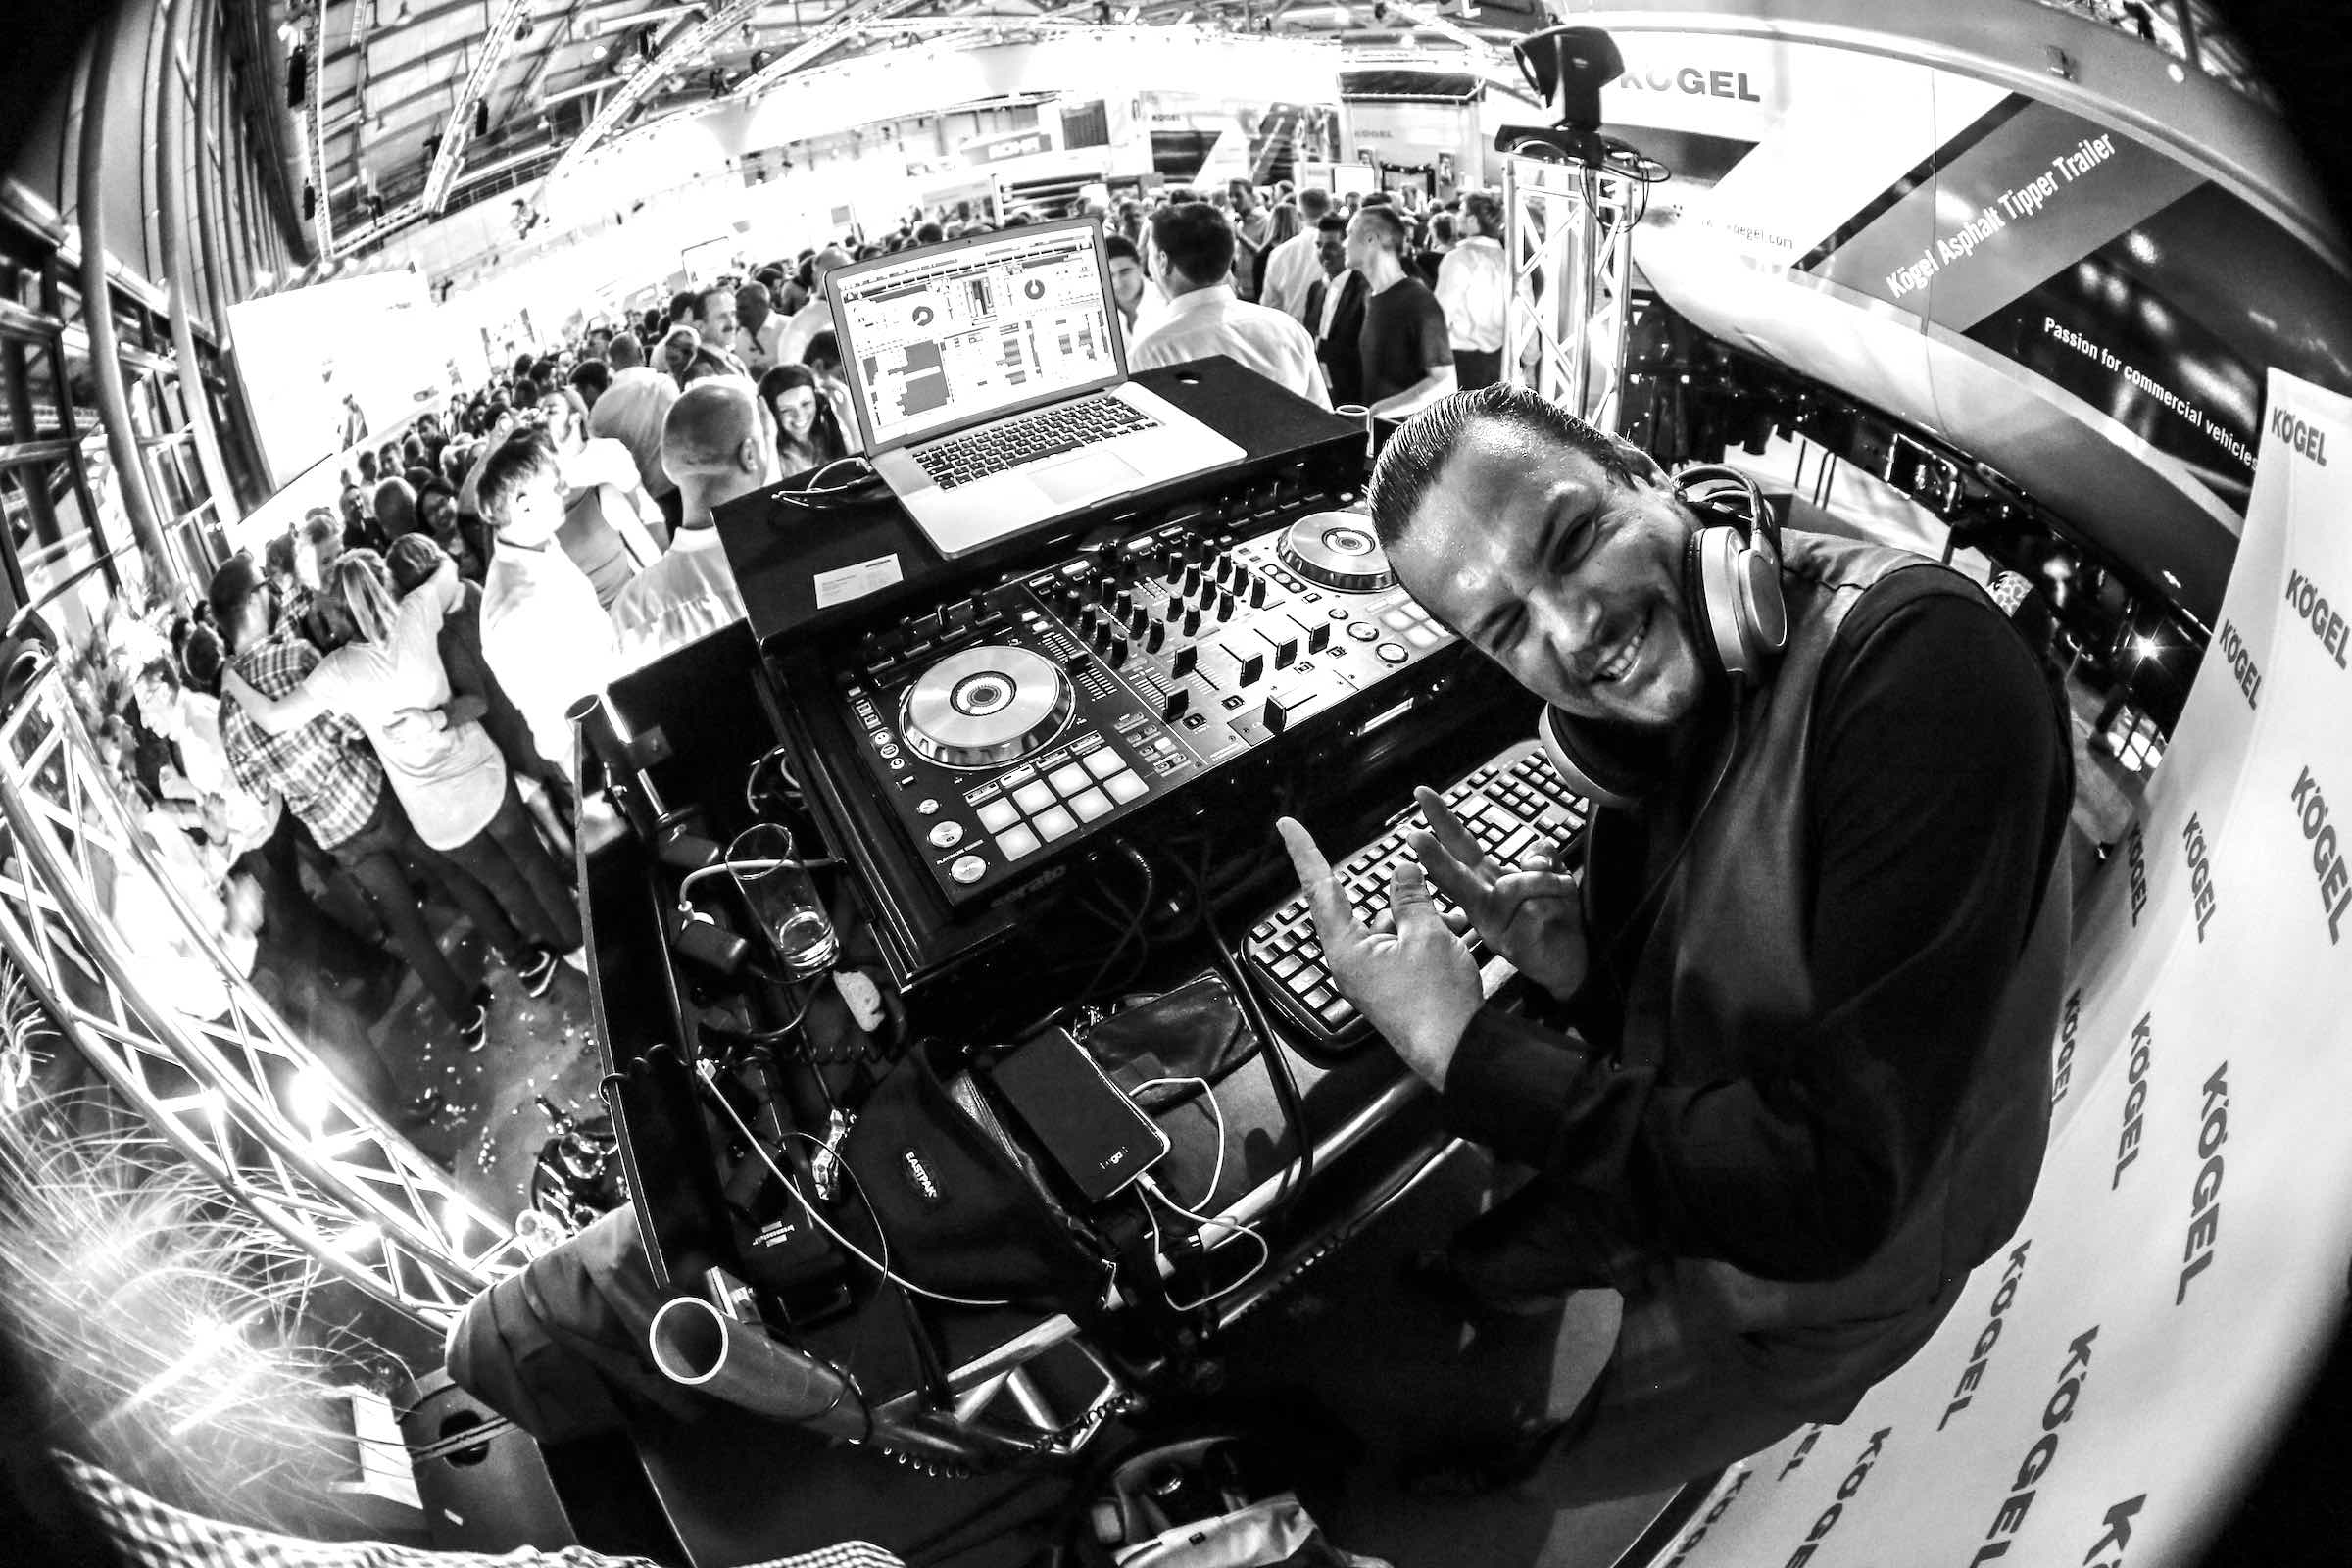 DJ | Firmenfeier | Mieten | DJ | Hannover | Marco | Kern | DJ | Hochzeit | Messe | DJ | Event | DJ | Geburtstag | DJ | Betriebsfeier | DJ | Buchen | Discjockey | Mieten | DJ | Agentur | DJ | HCC | Lehmann | Eventservice